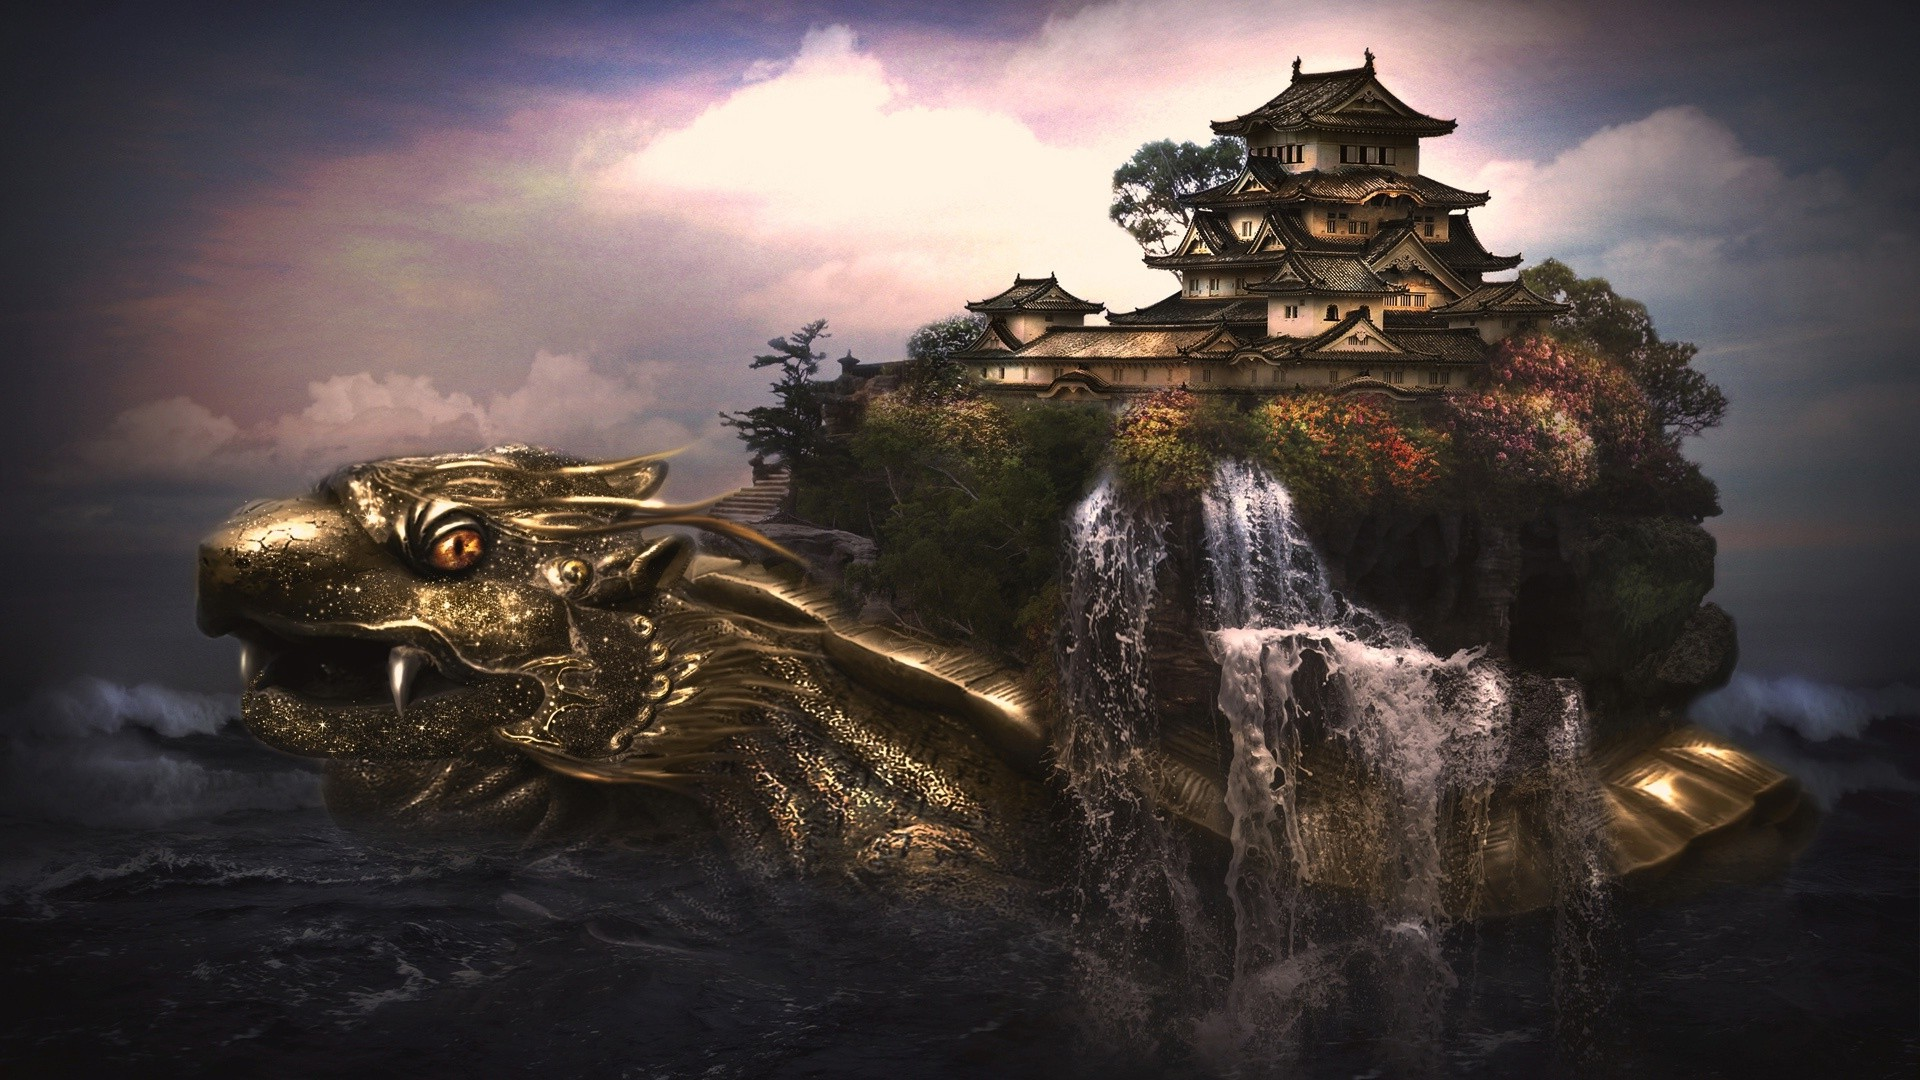 Cool Cars Wallpaper For Mobile Dragon Digital Art Fantasy Art Turtle Wallpapers Hd